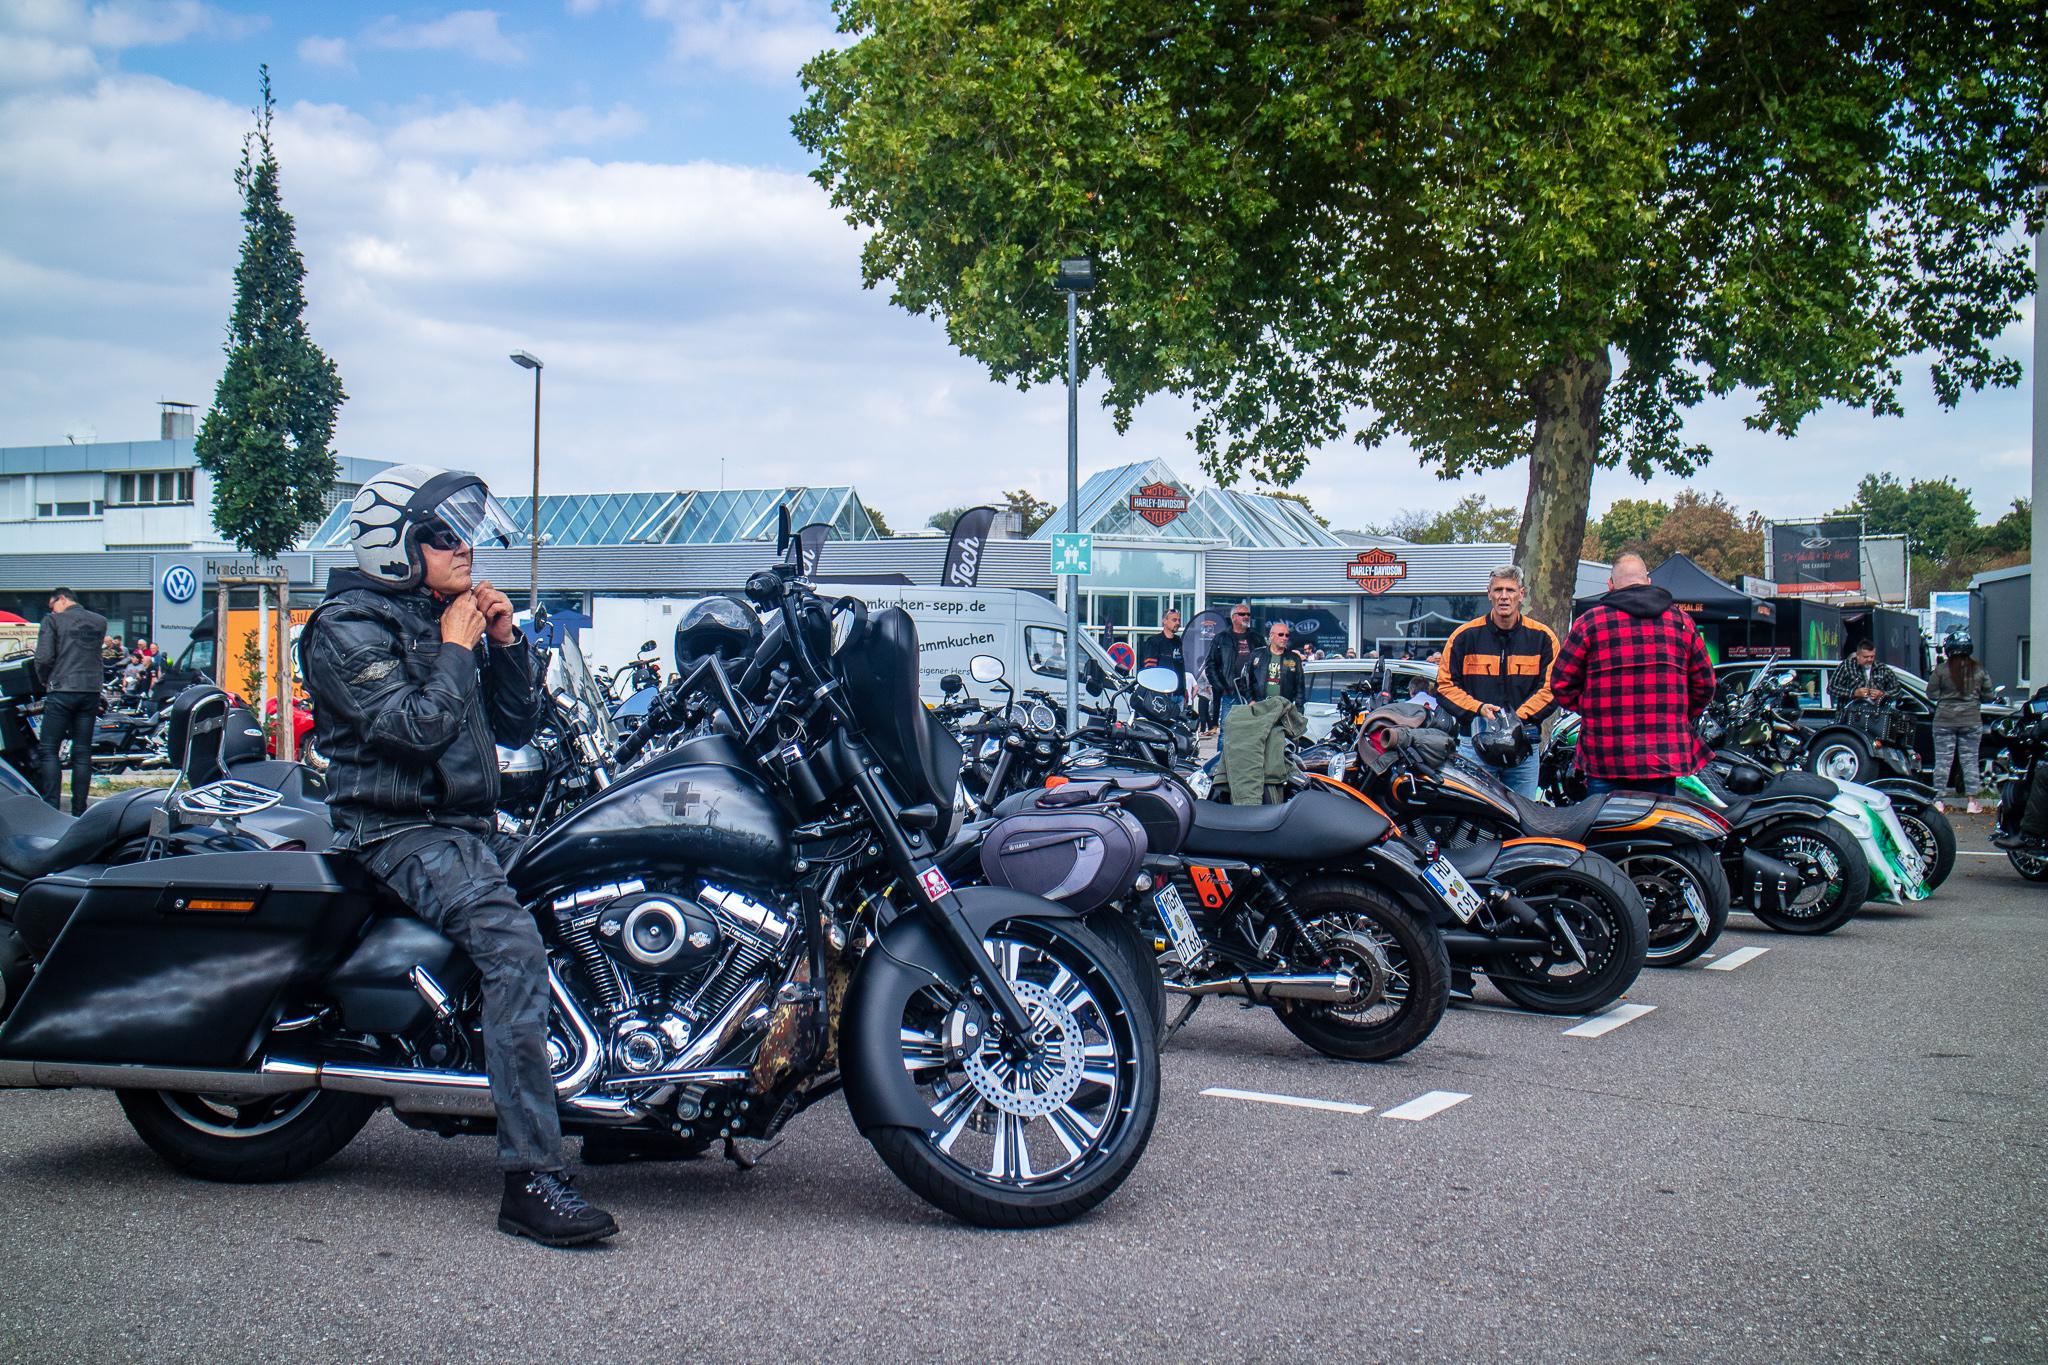 Harley-Davidson Bruchsal: 14. - 15.09.2018 | Grand Opening